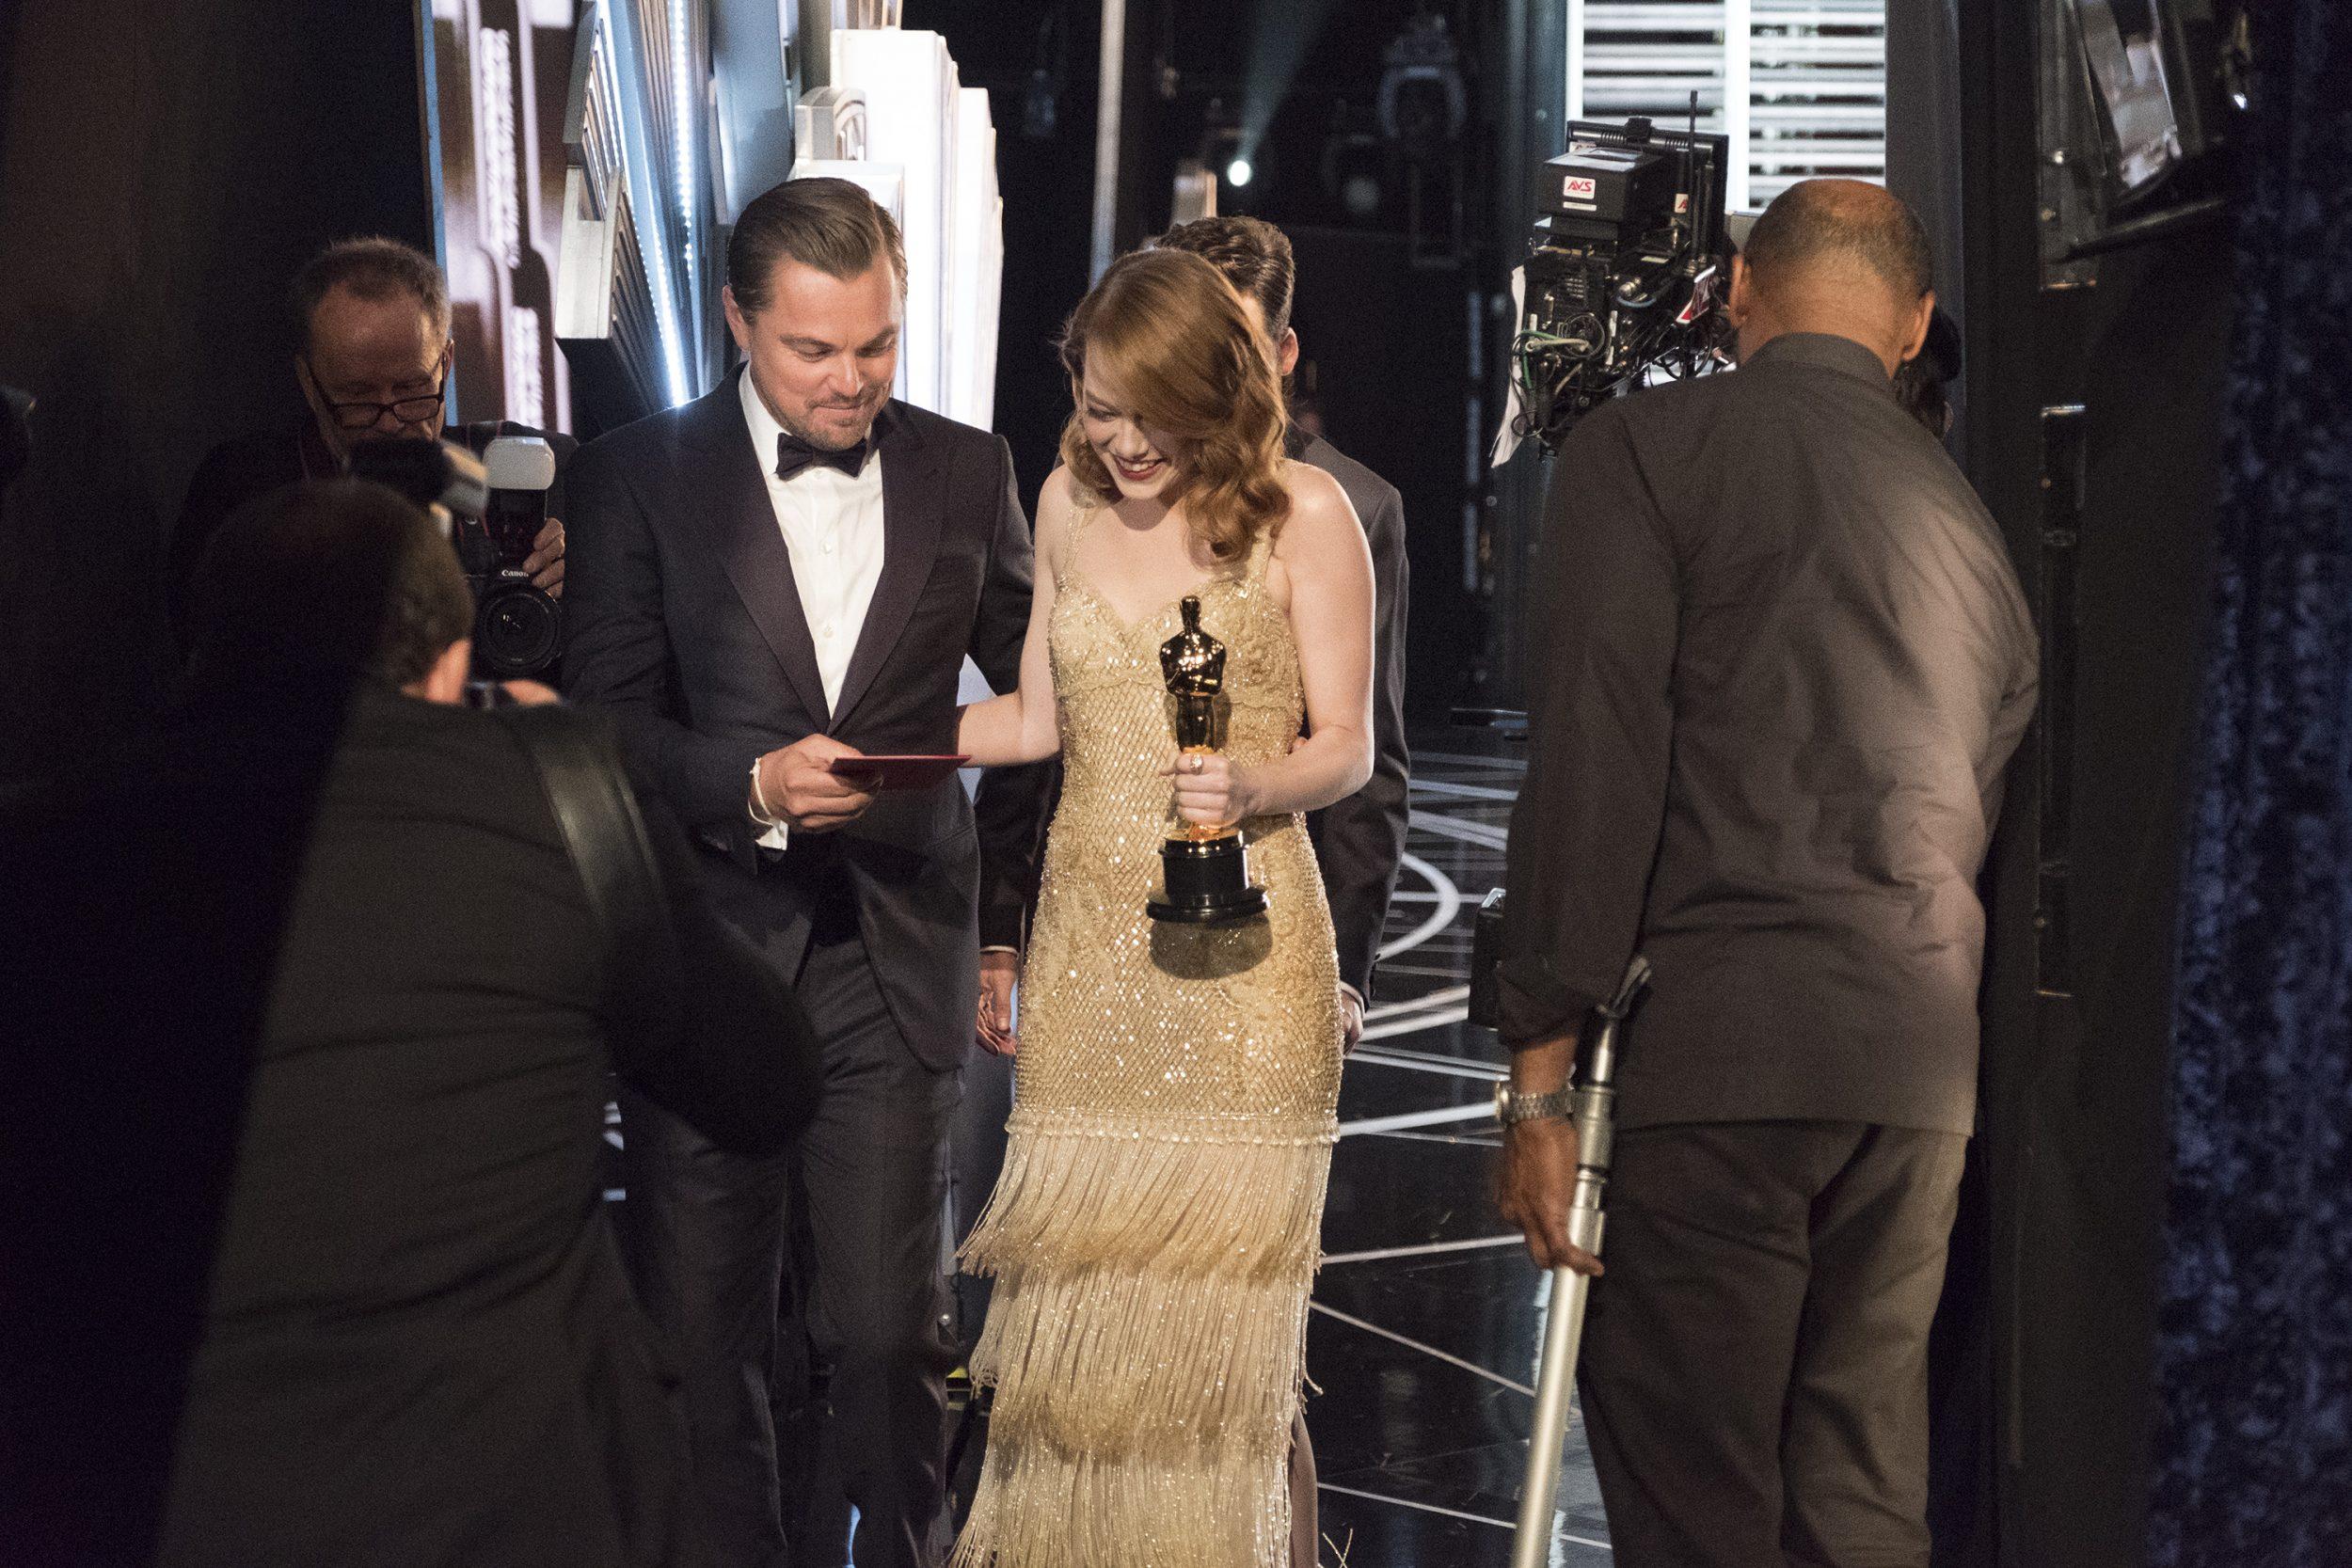 THE OSCARS(r) - The 89th Oscars(r)  broadcasts live on Oscar(r) SUNDAY, FEBRUARY 26, 2017, on the ABC Television Network. (ABC/Adam Rose) LEONARDO DICAPRIO, EMMA STONE